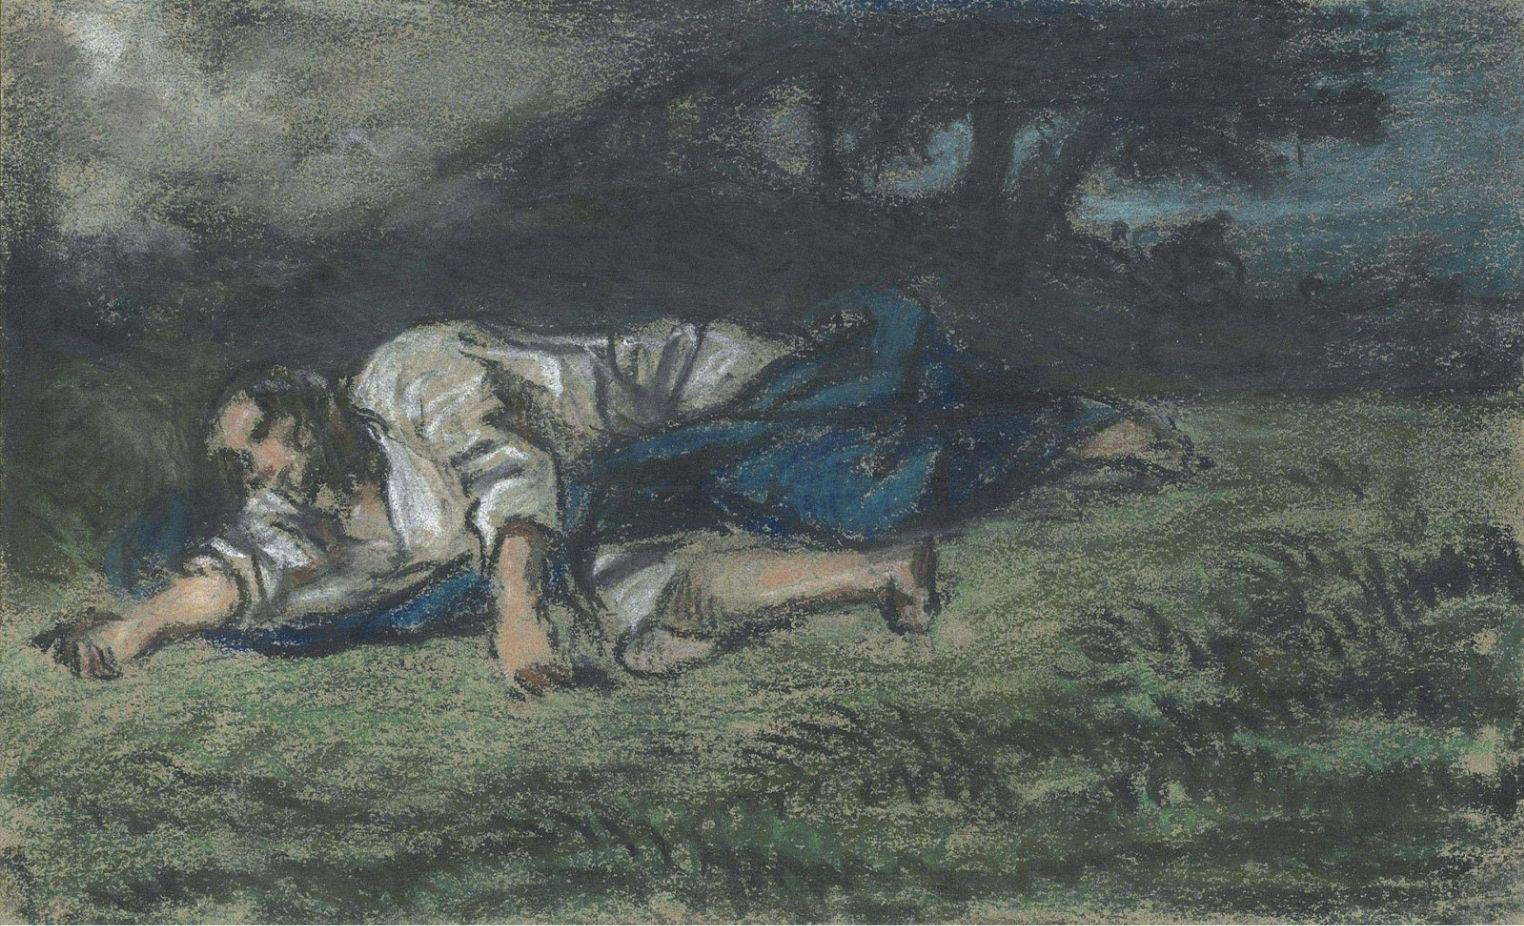 Eugene Delacroix (1798-1863) The Agony in the Garden 1851 (15,5 x 25 cm)